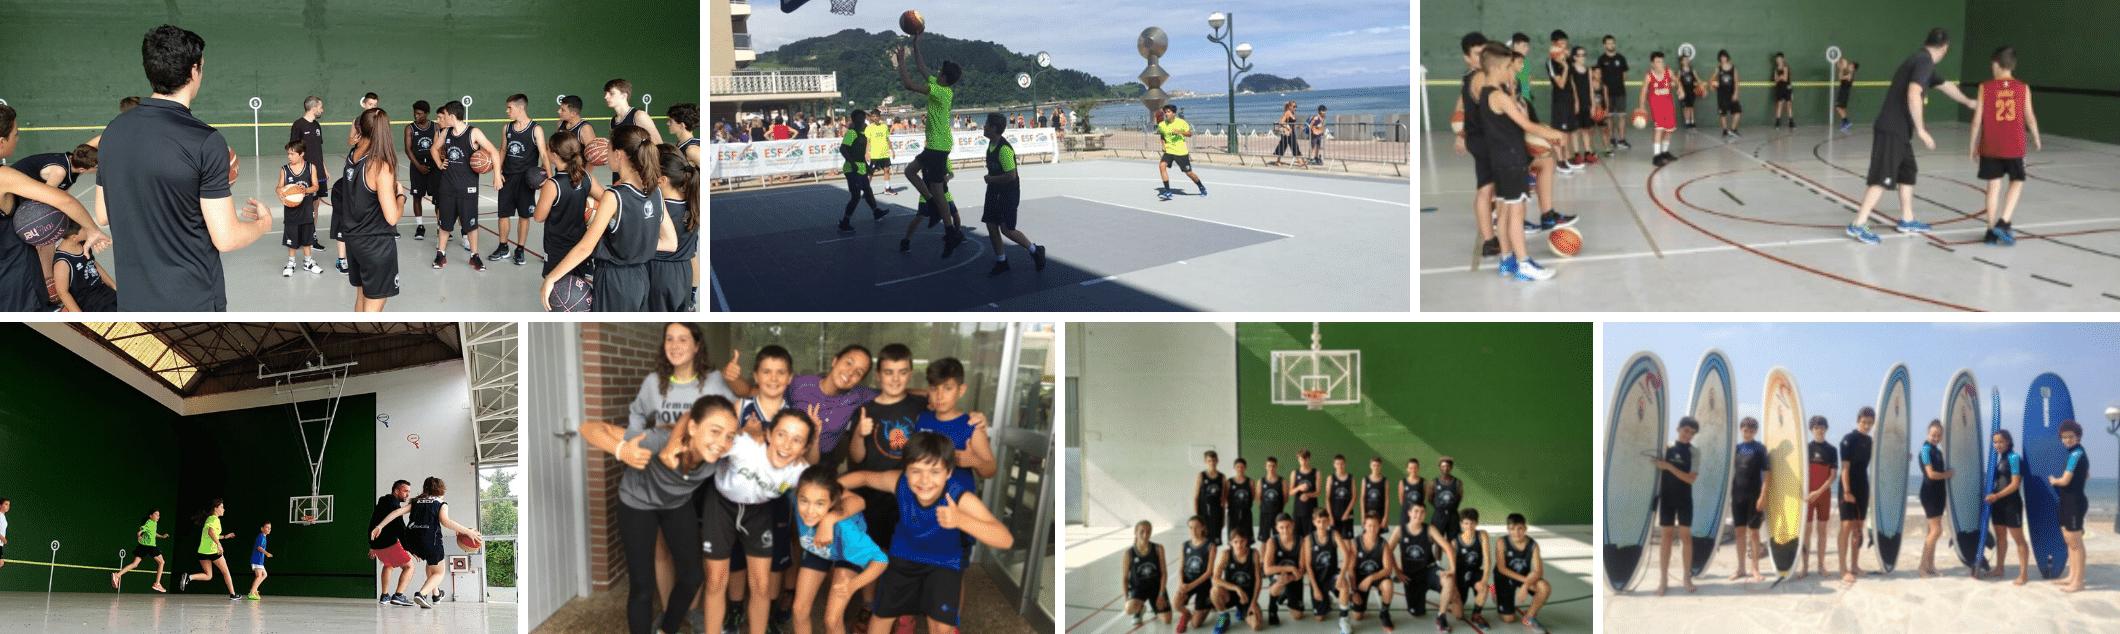 Verano 2020; Basket Zarautz